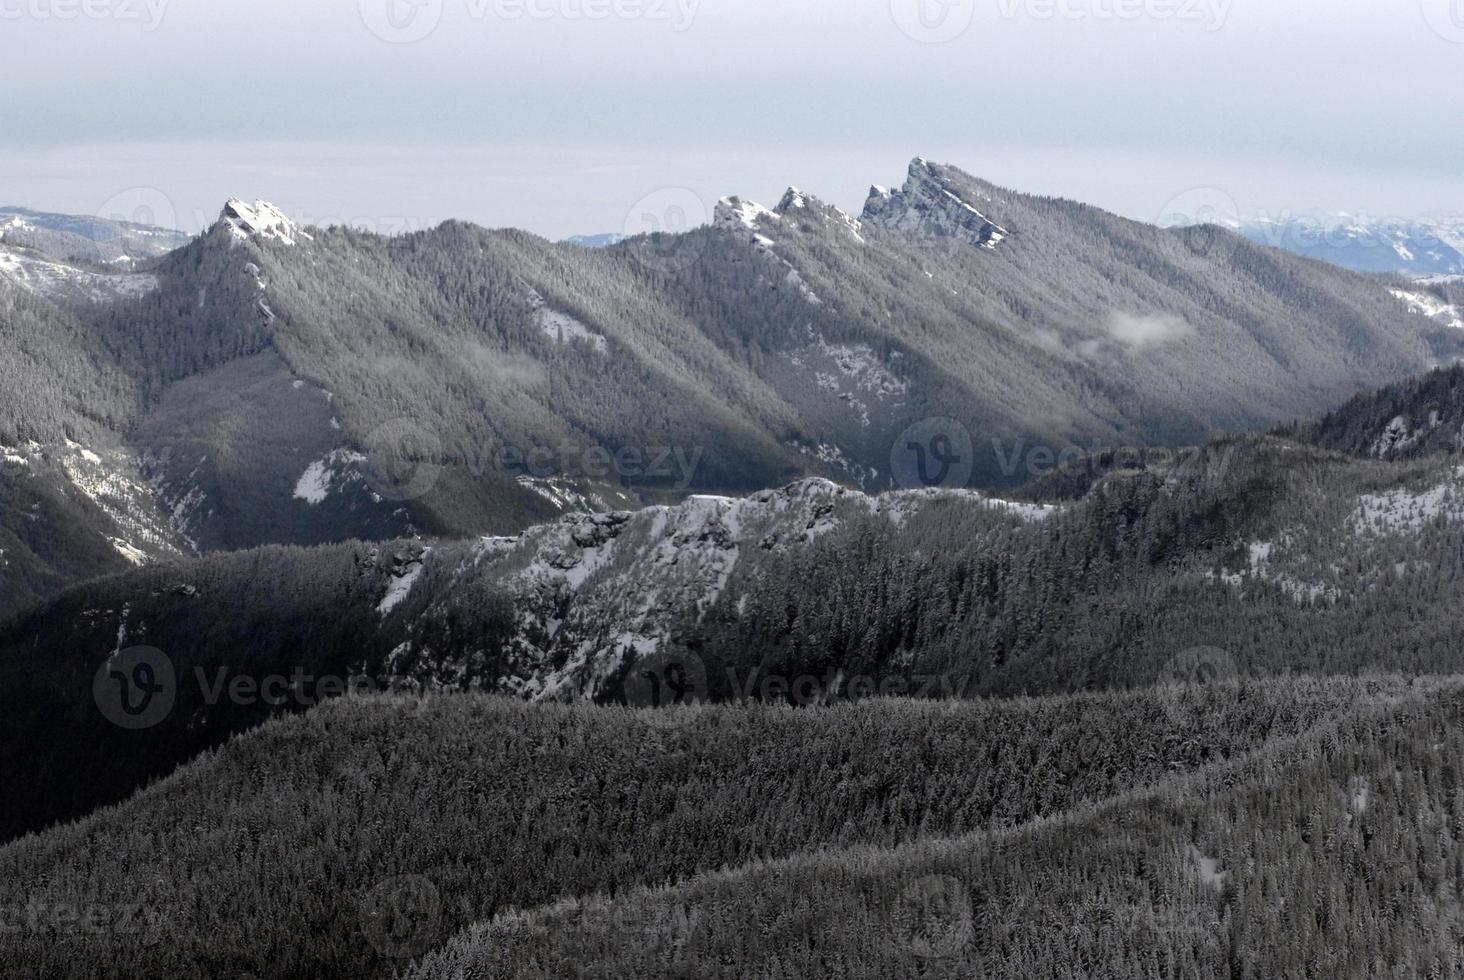 montagnes en cascade, état de washington photo